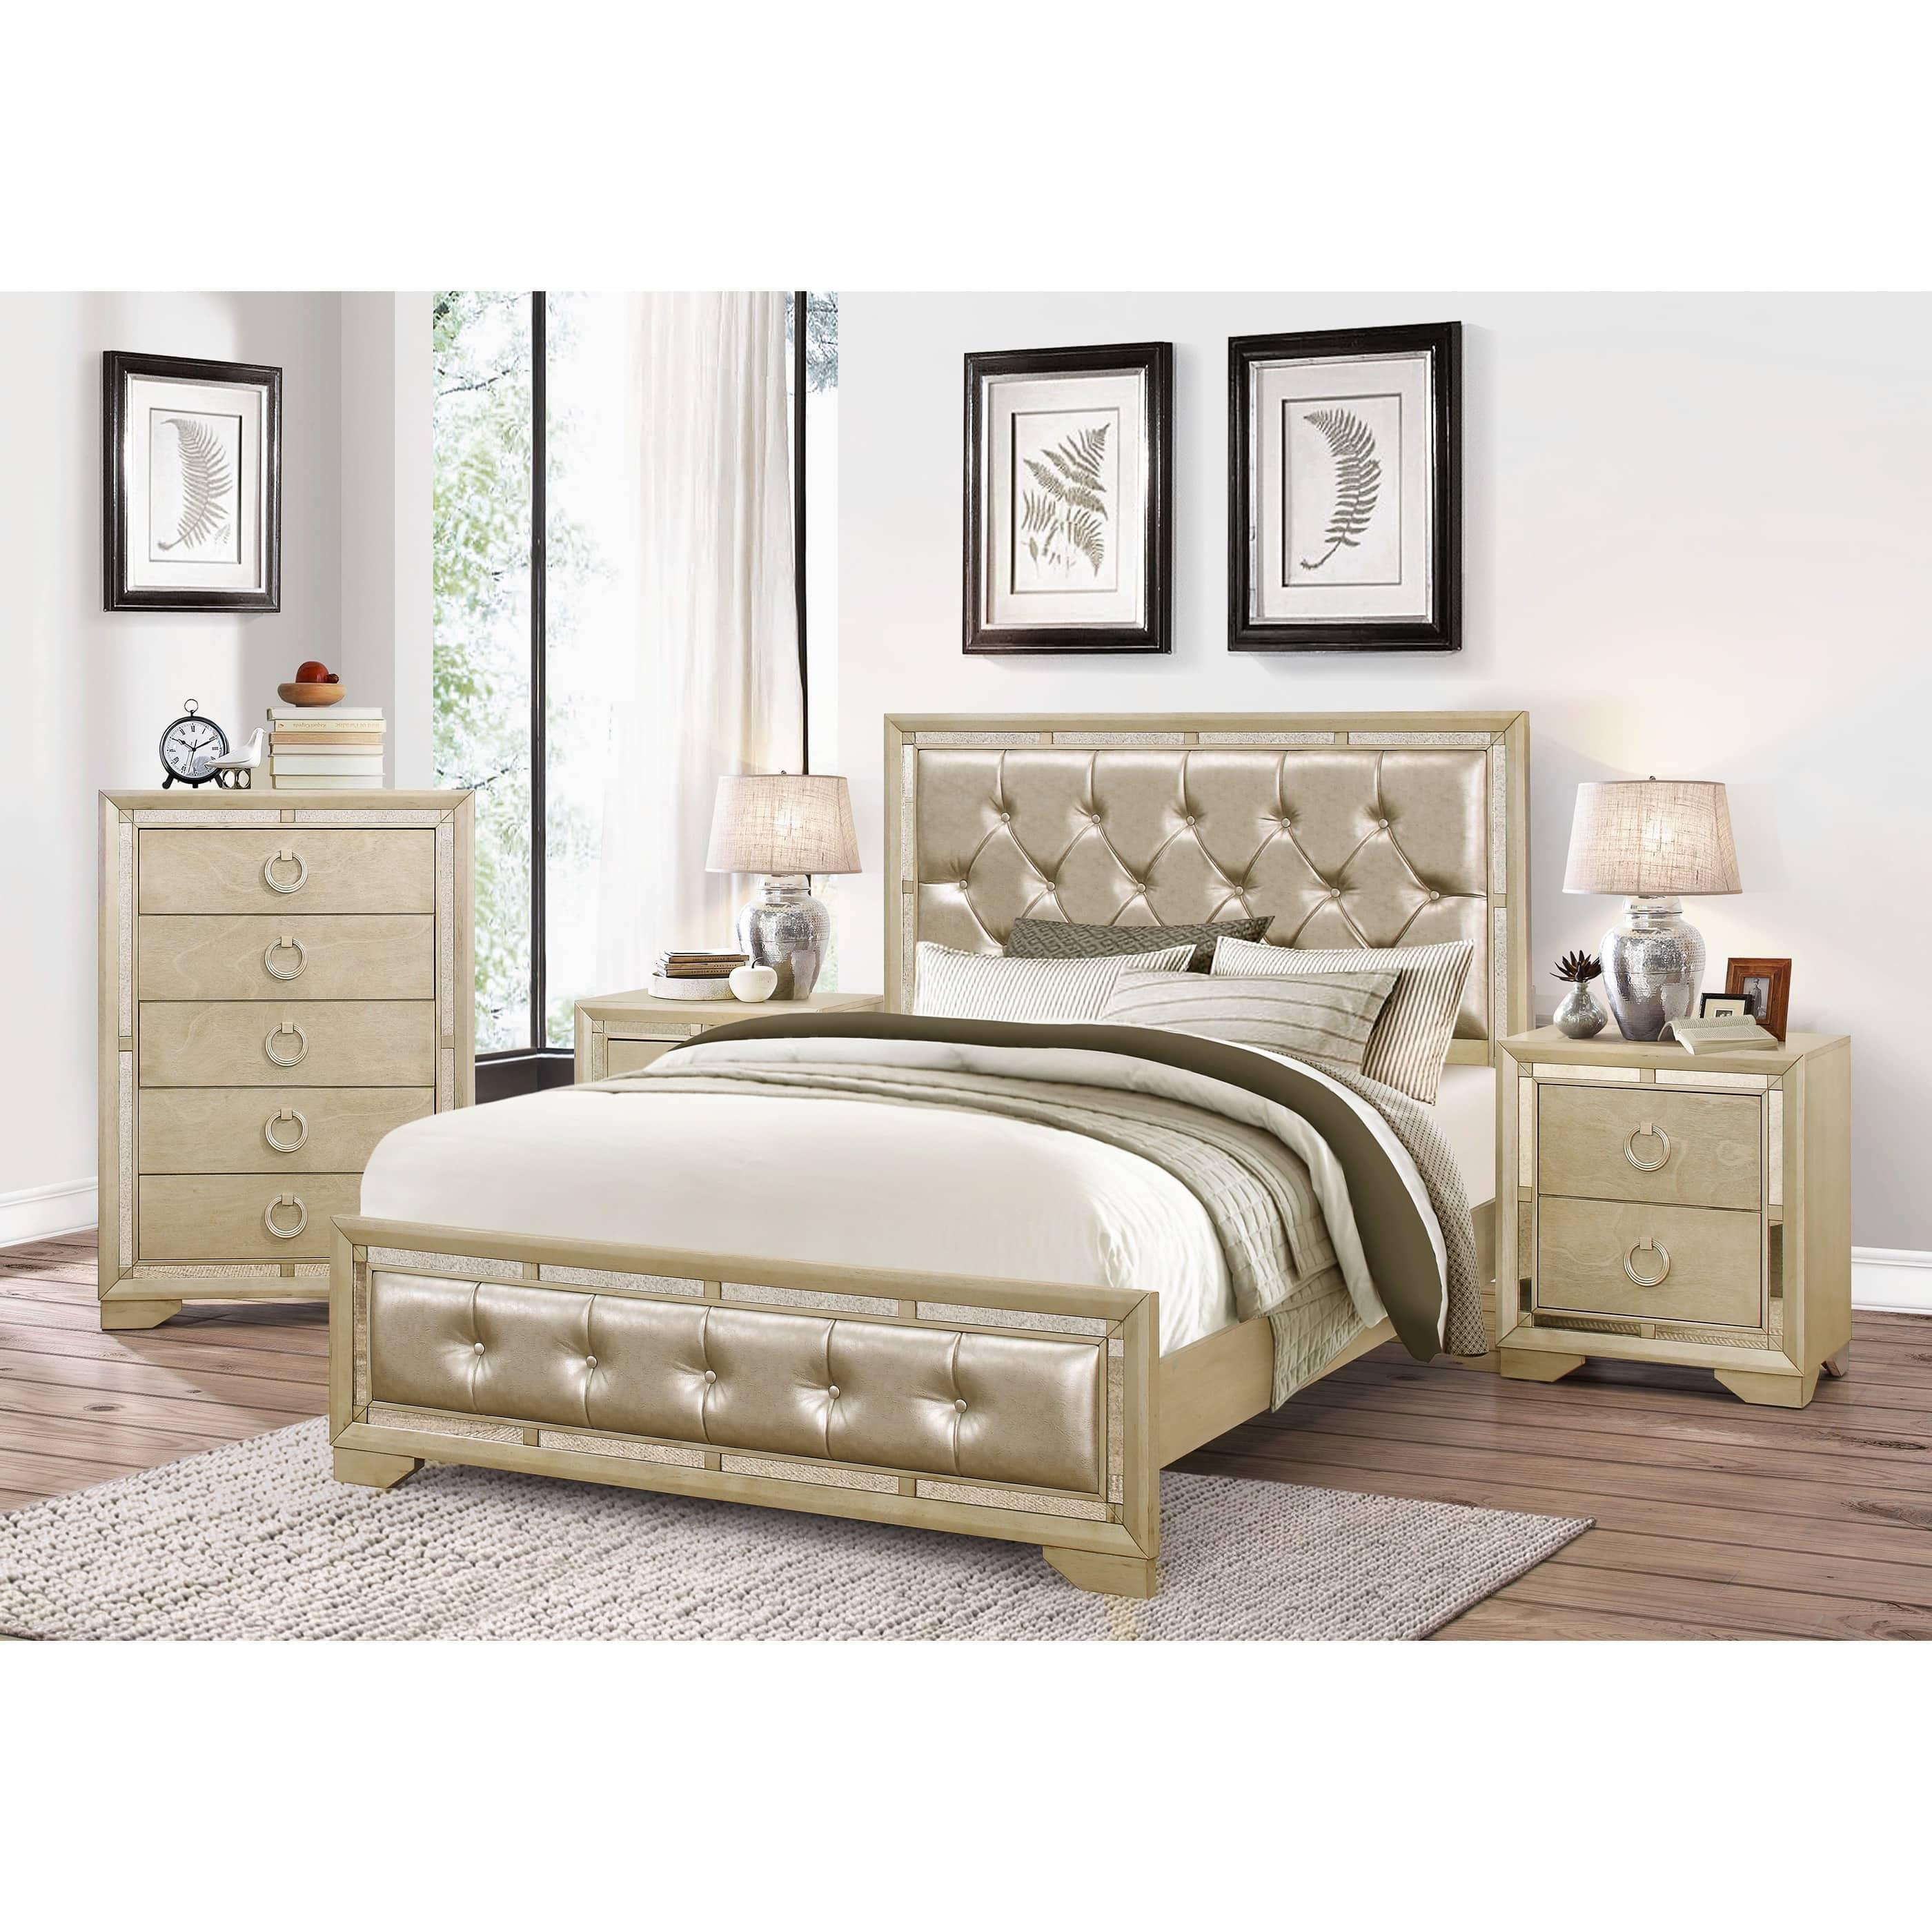 Buy Beds Online At Overstock.com